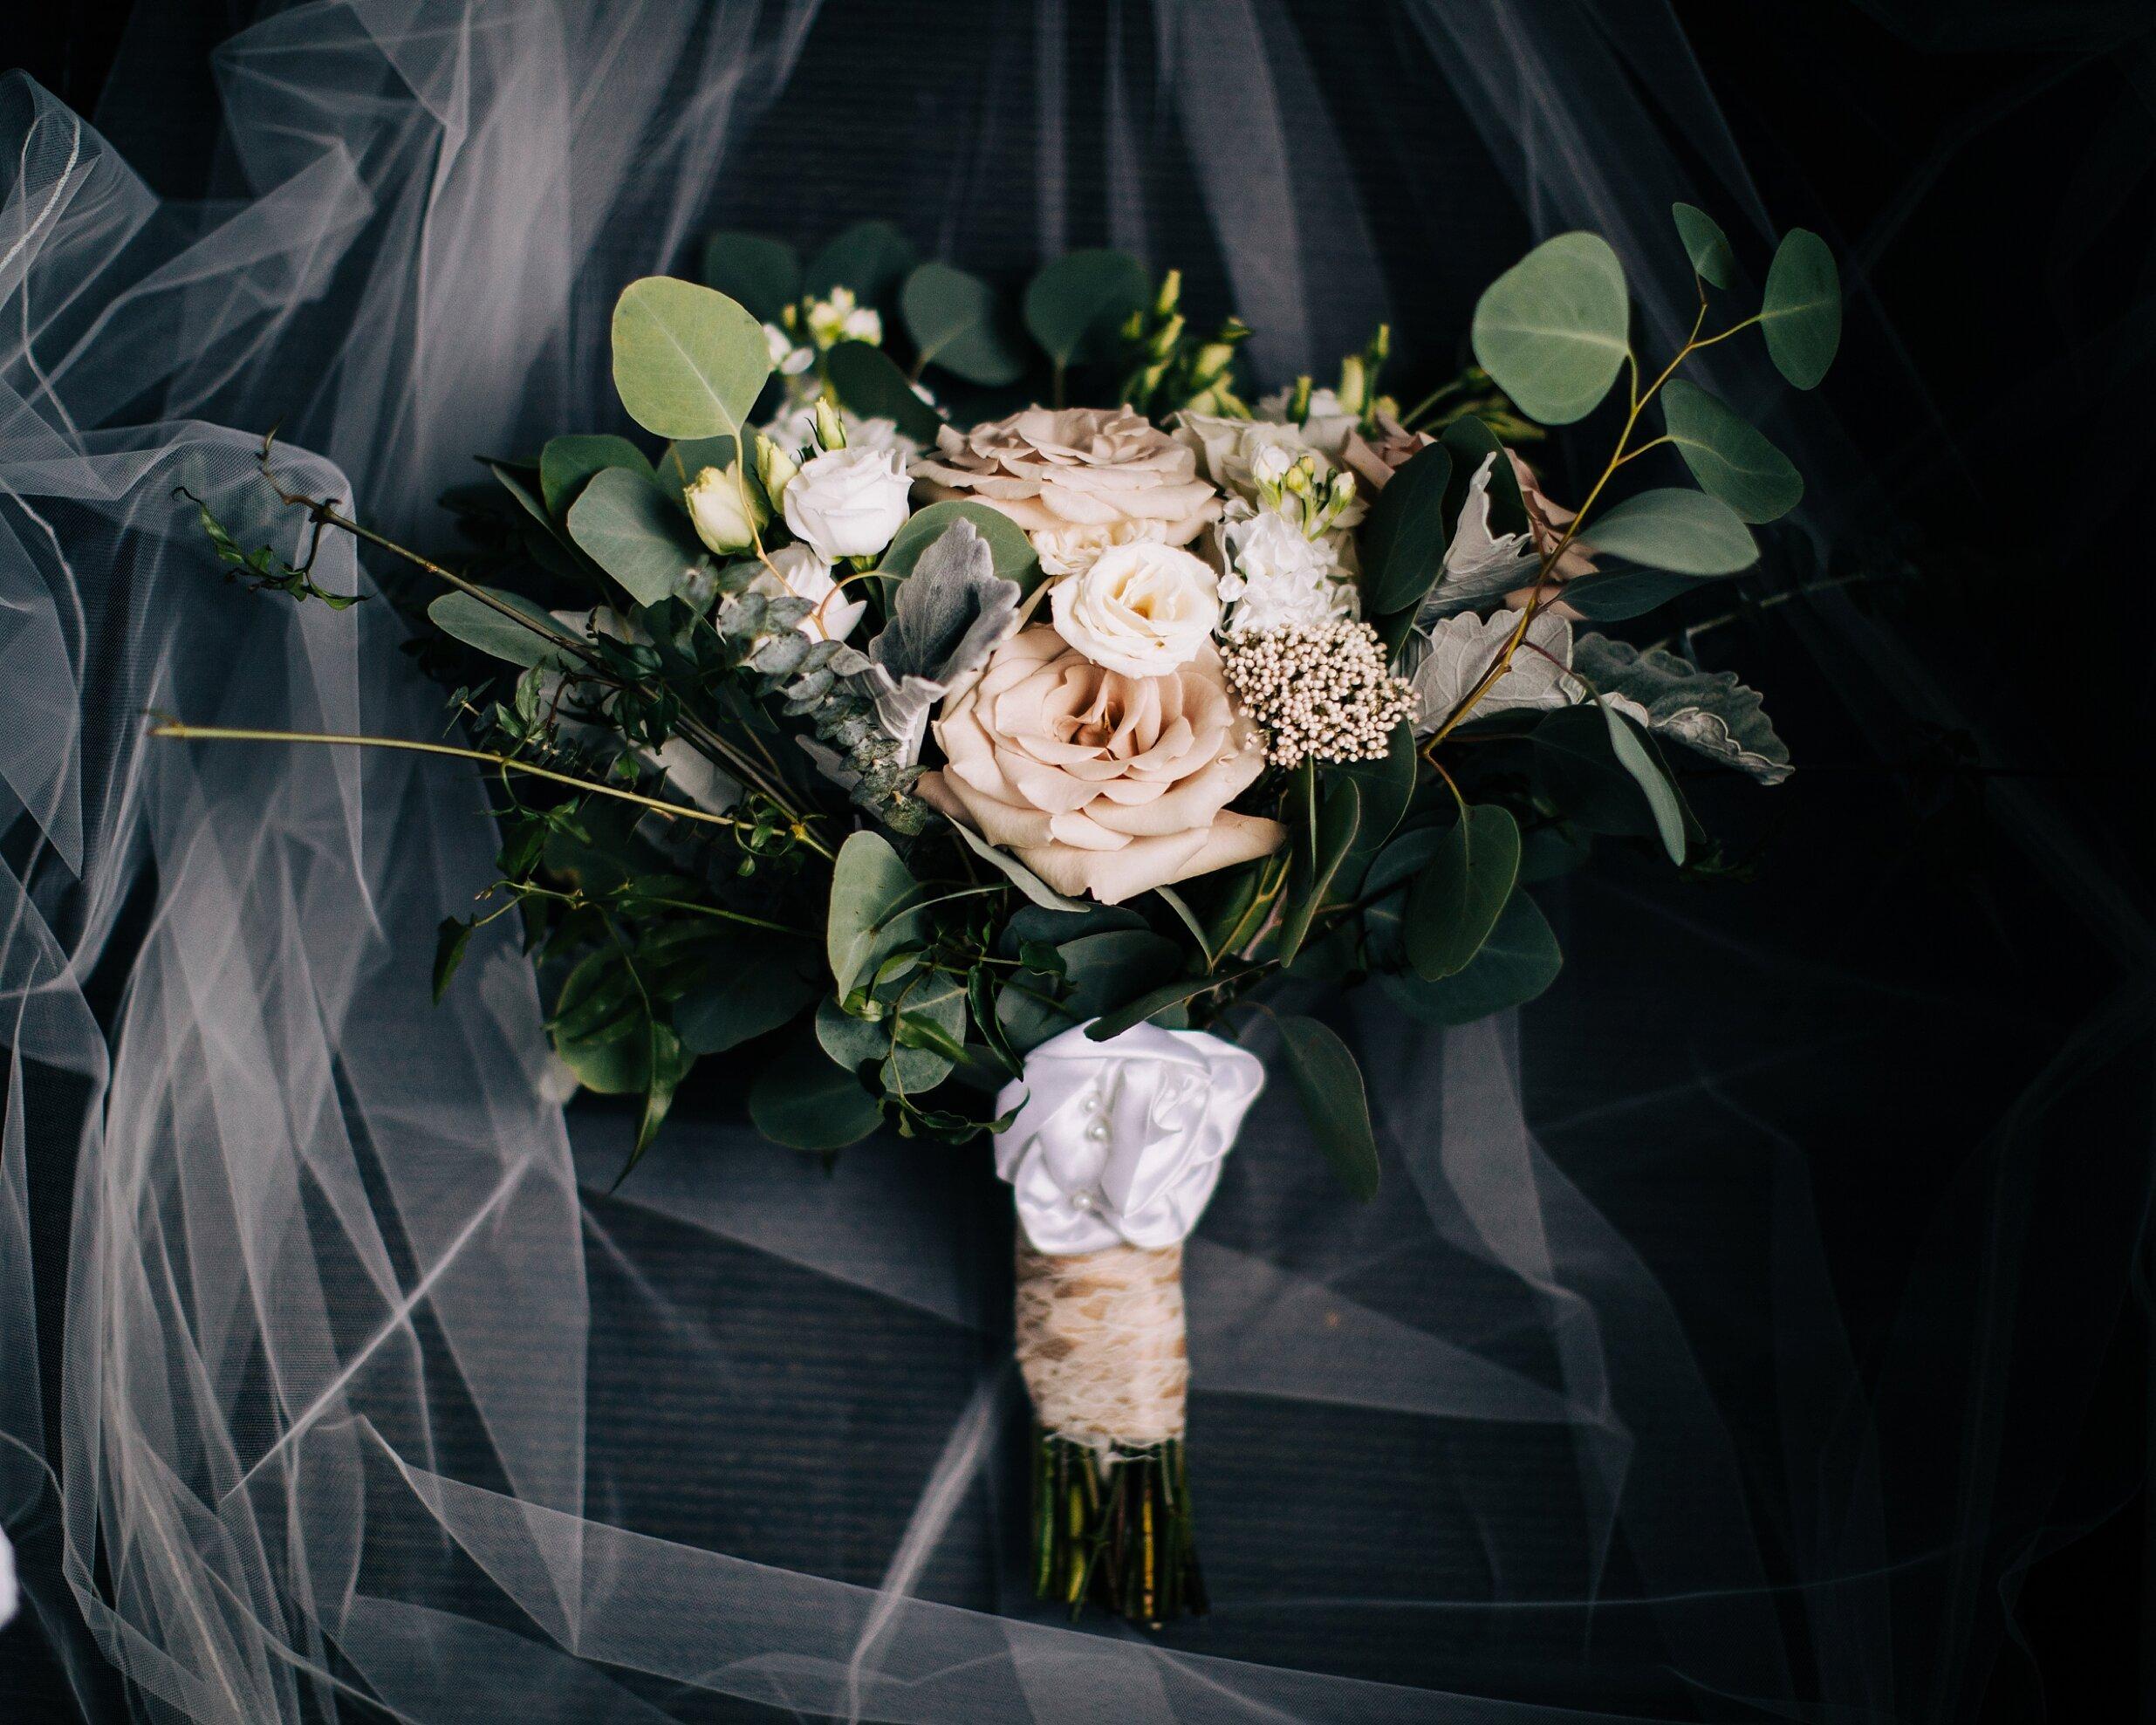 ryland-inn-nj-photographer-wedding_0025.jpg